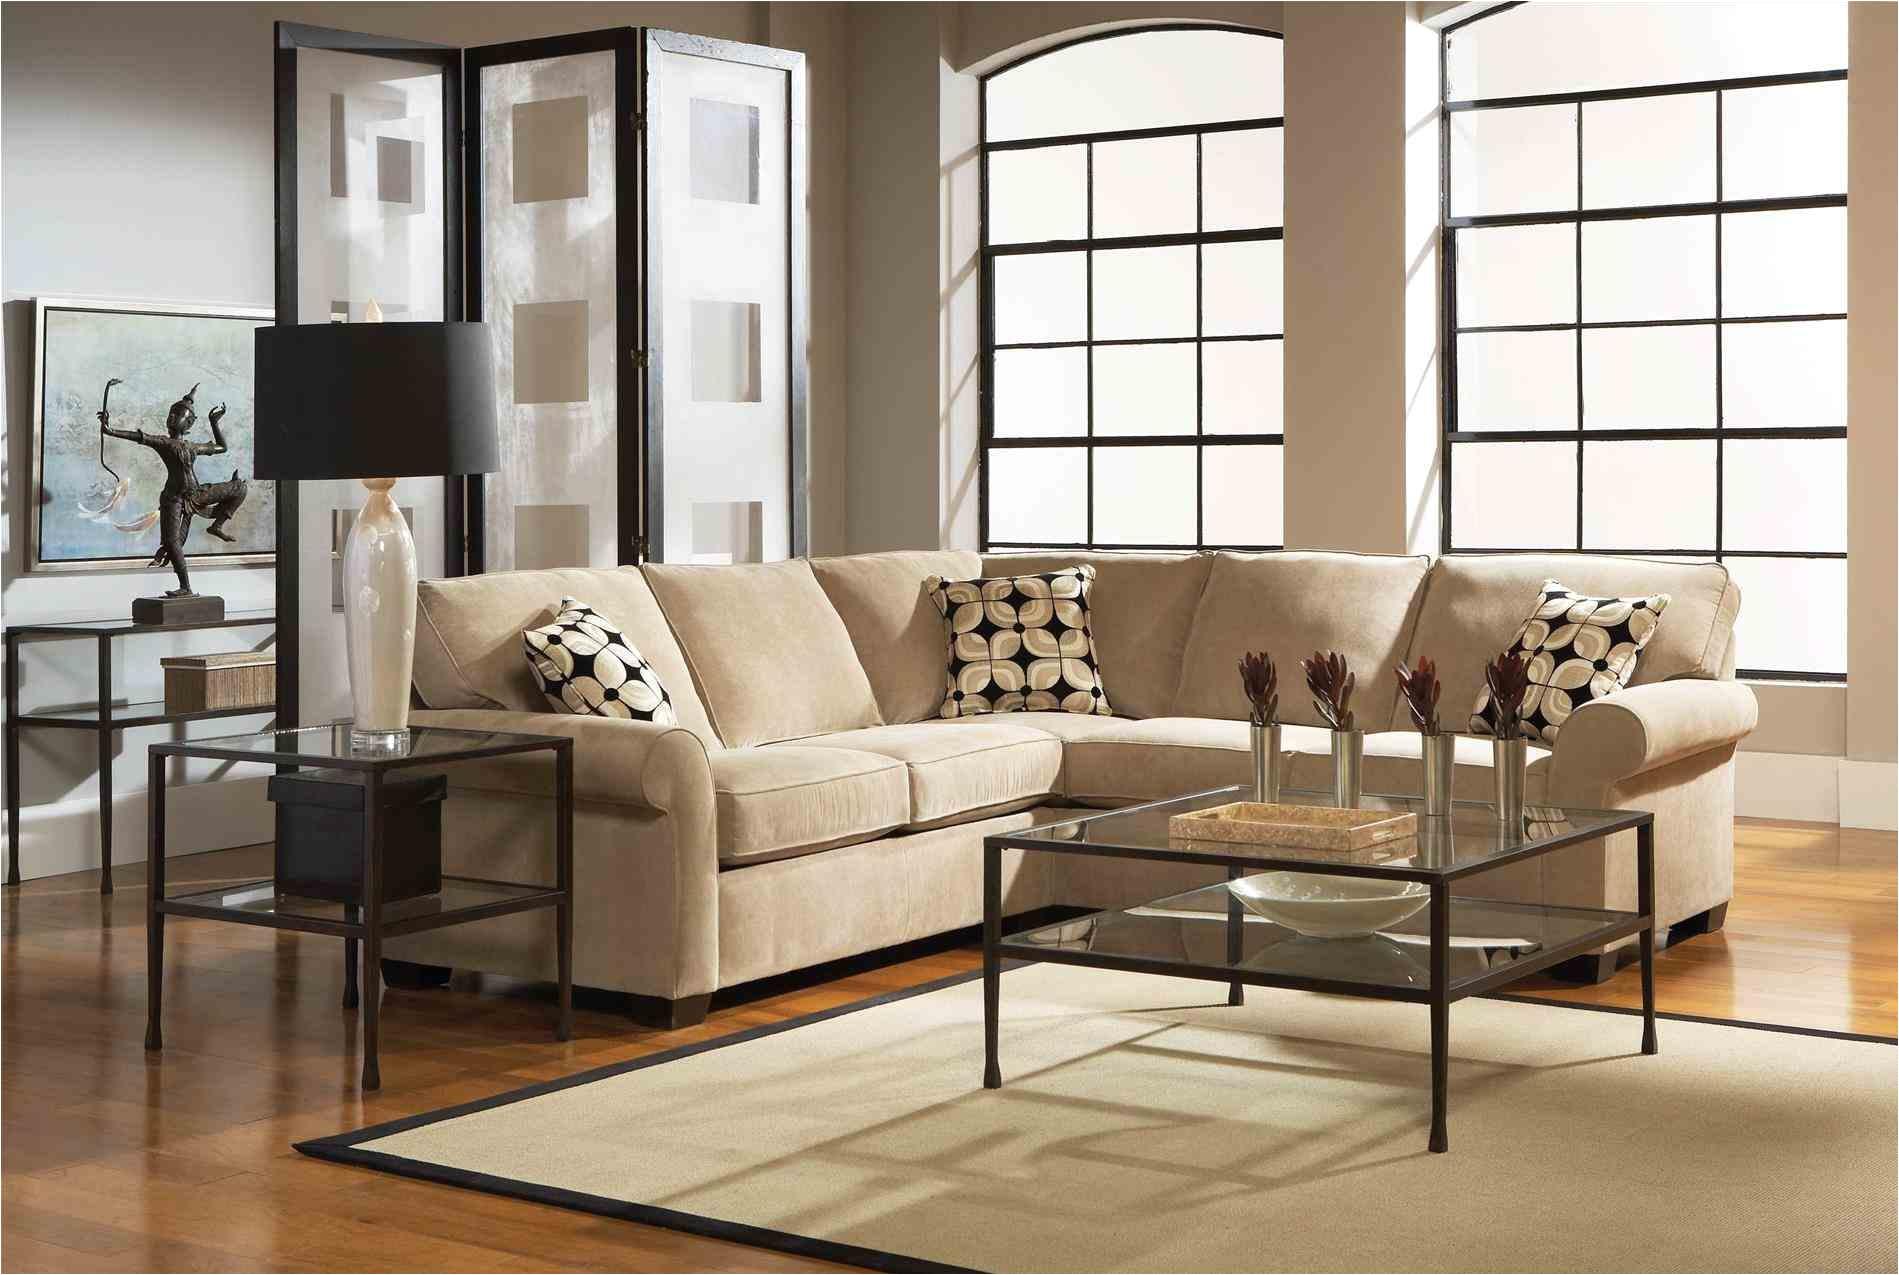 Craigslist Ct Furniture New Craigslist Ct Furniture